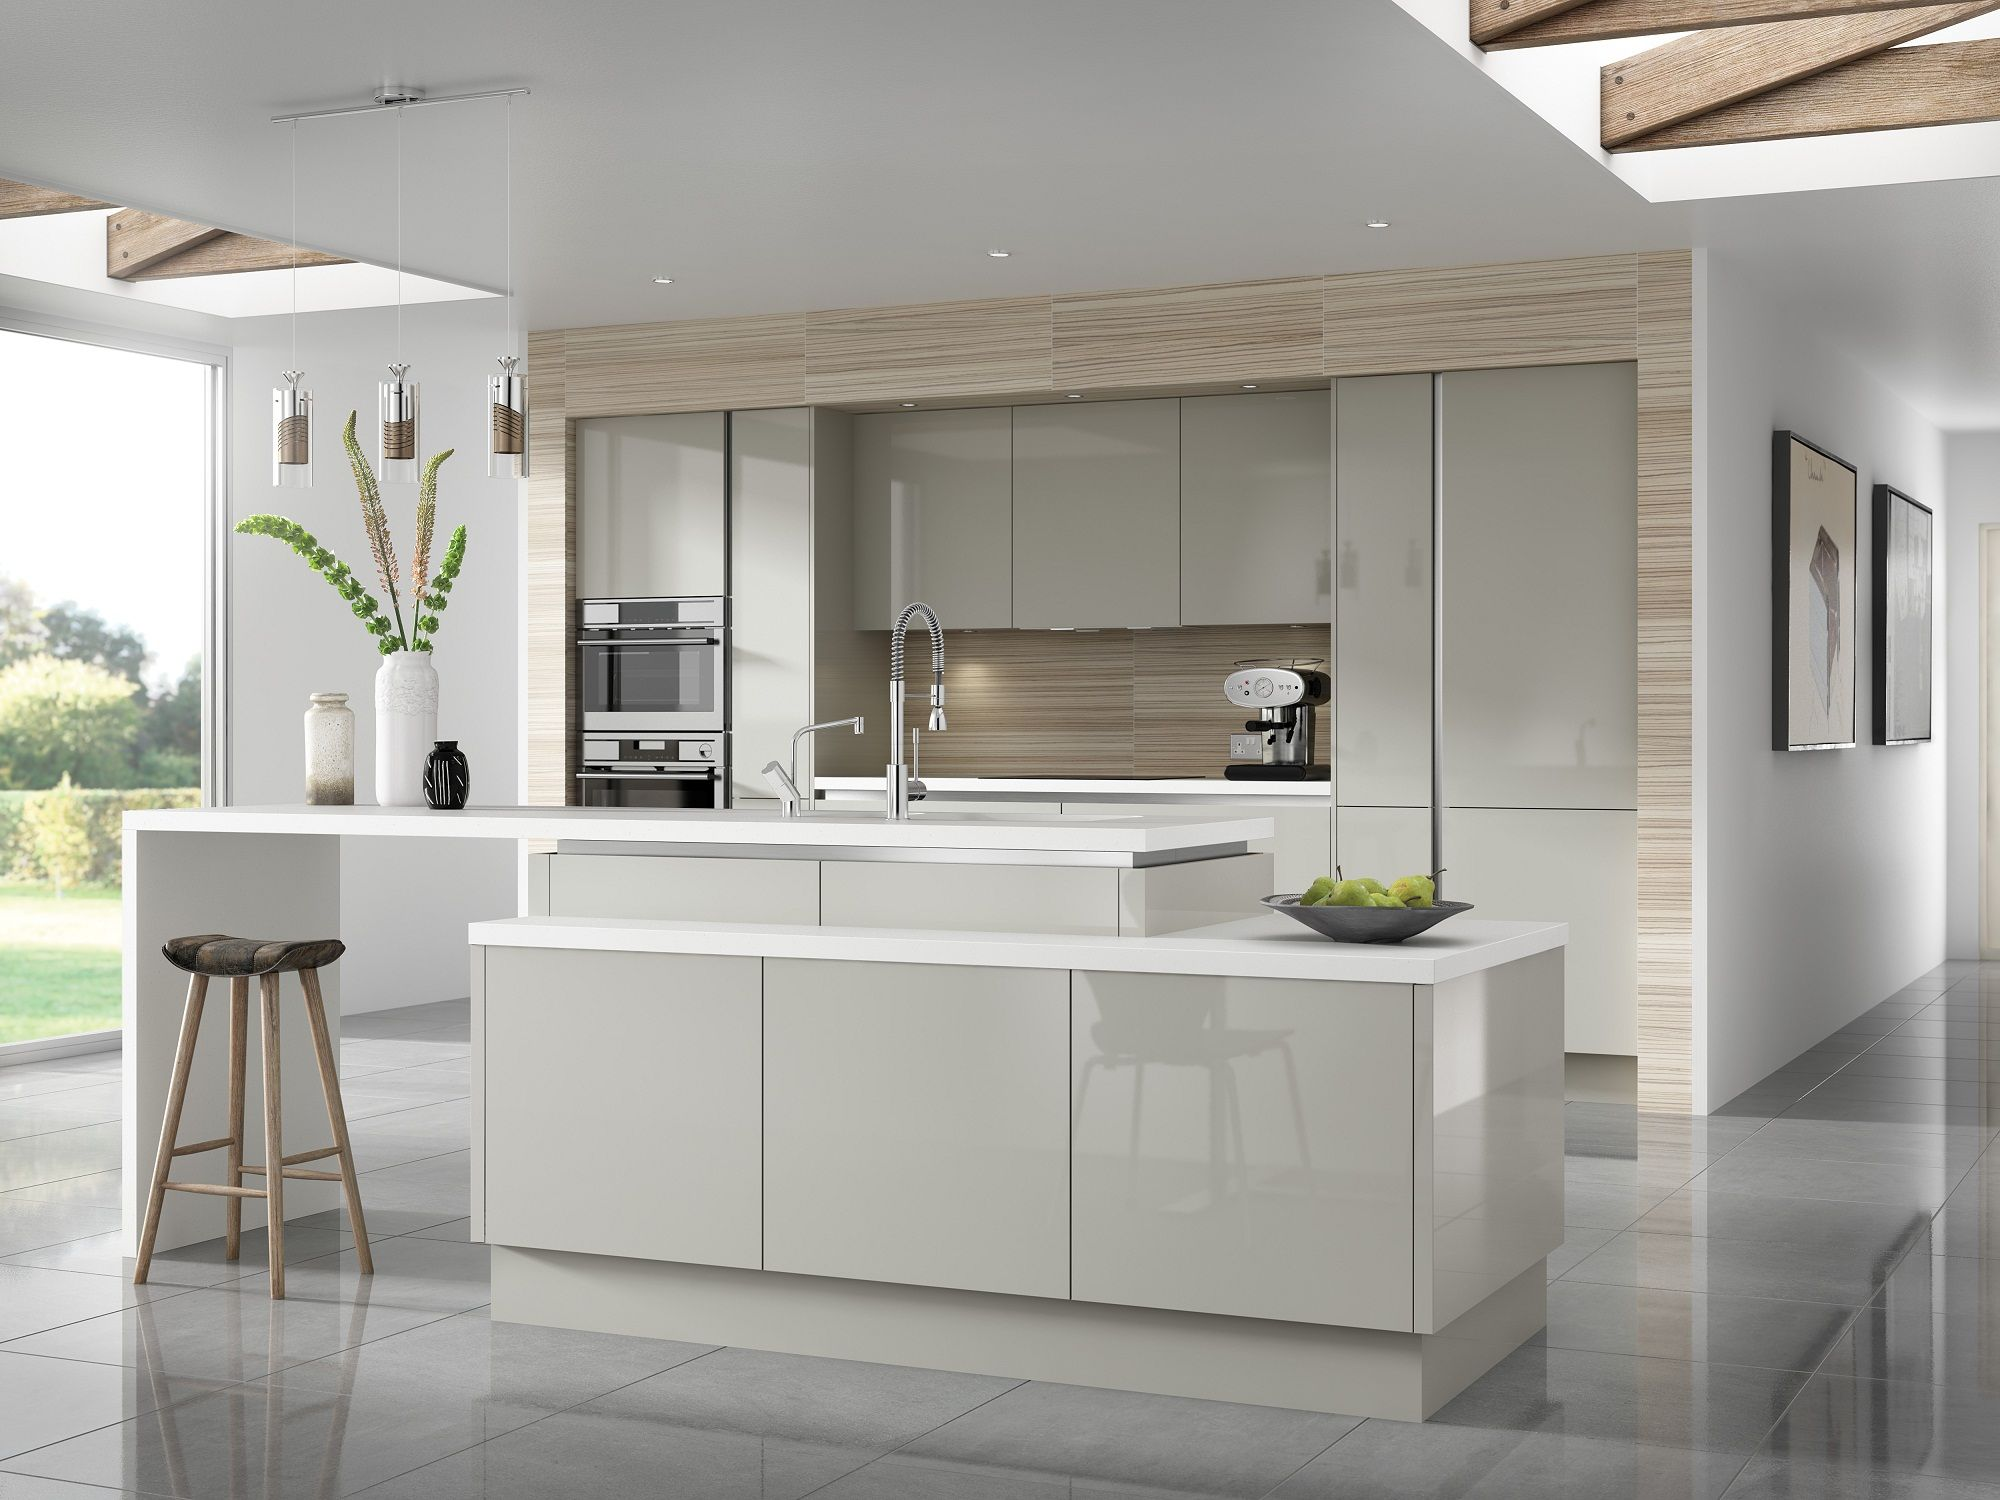 Luna Stunning Gloss Light Grey Handleless Kitchen Door Part Of The New Horizon Range Http Www Moores Handleless Kitchen Light Grey Kitchens Glossy Kitchen